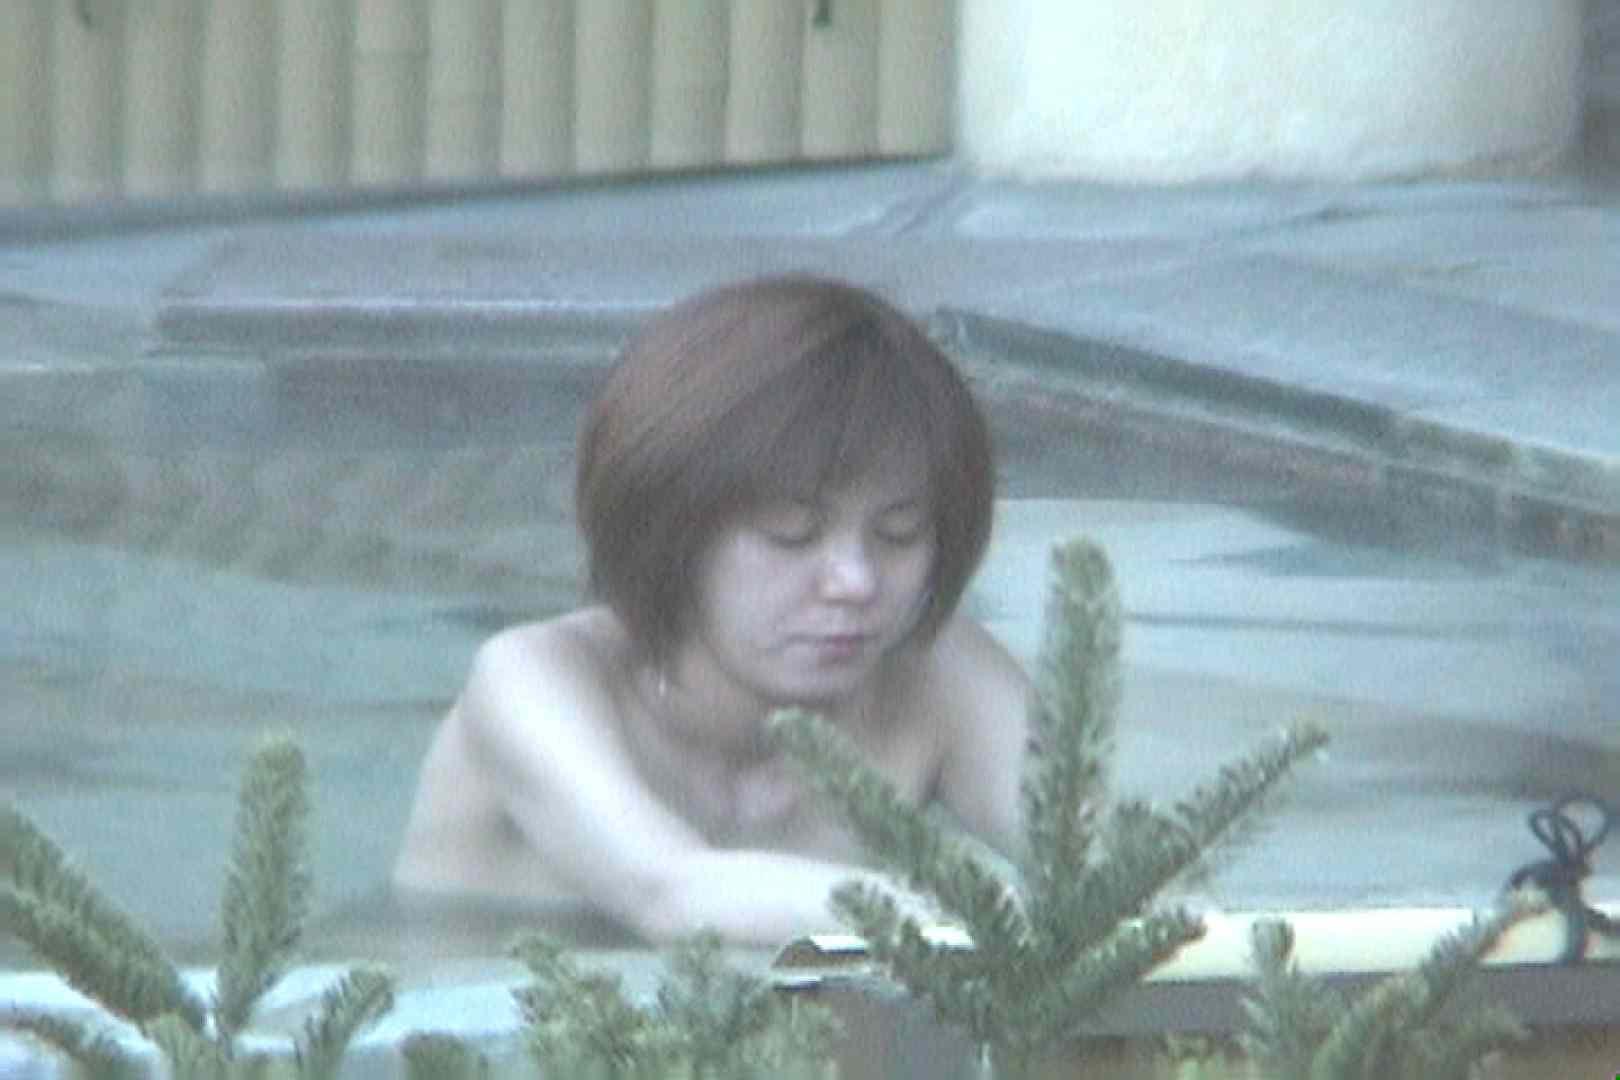 Aquaな露天風呂Vol.560 露天 | HなOL  62pic 39